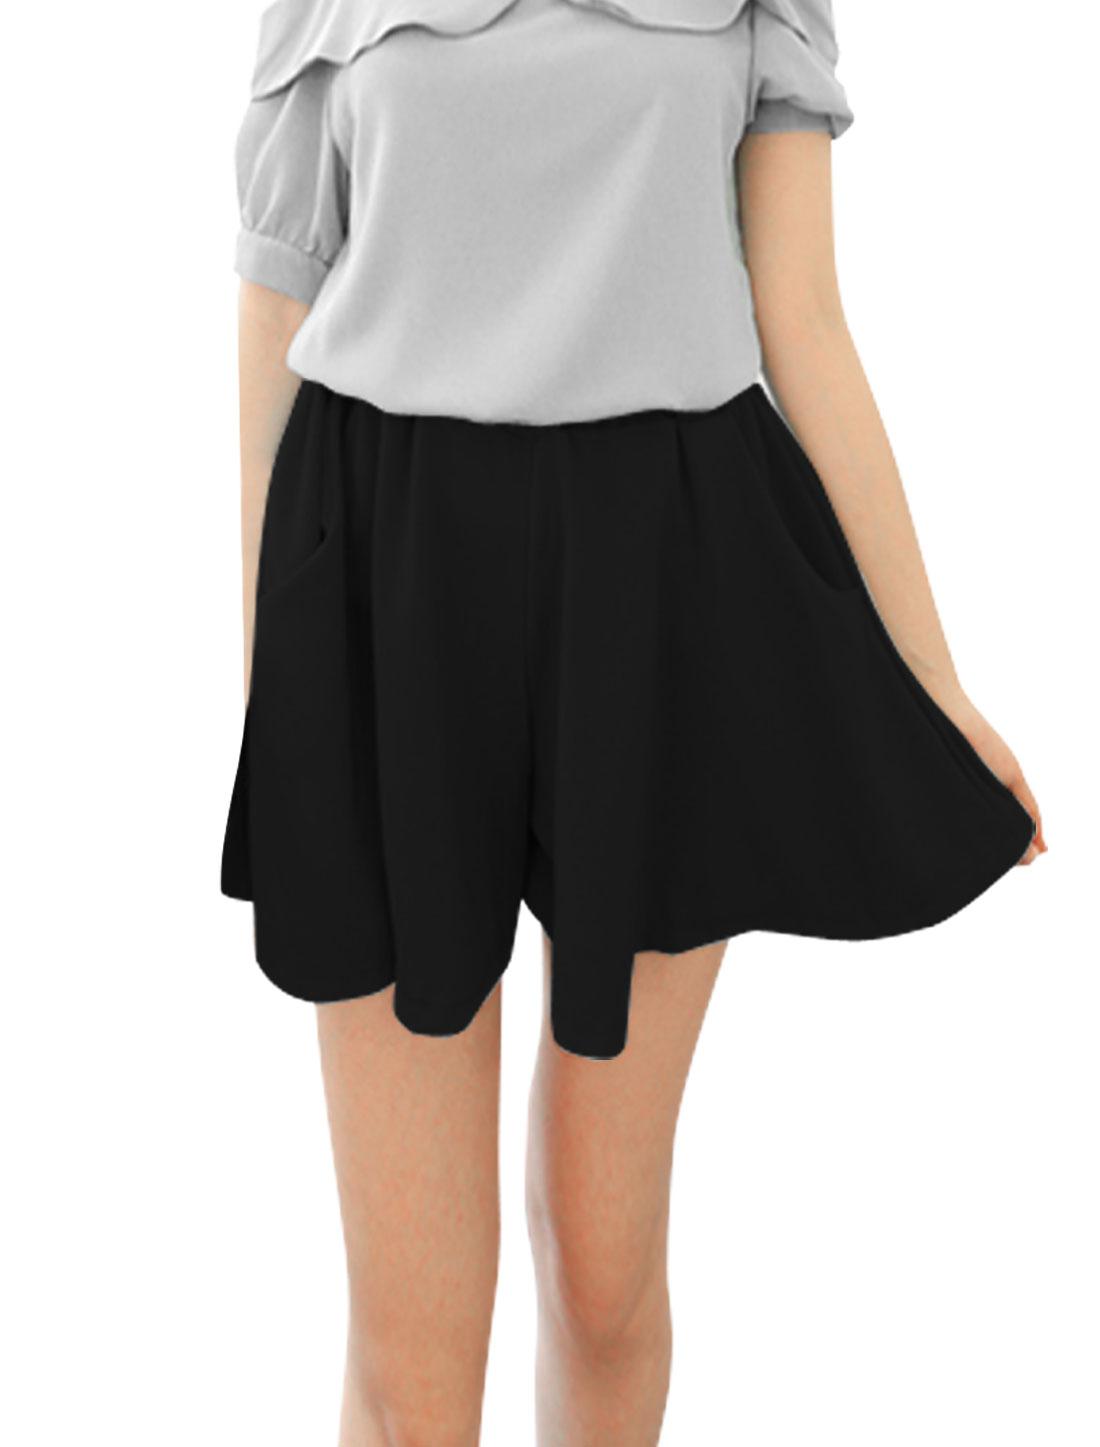 Ladies Mini Chiffon Slant Pockets Sexy Chic Shorts Black XS